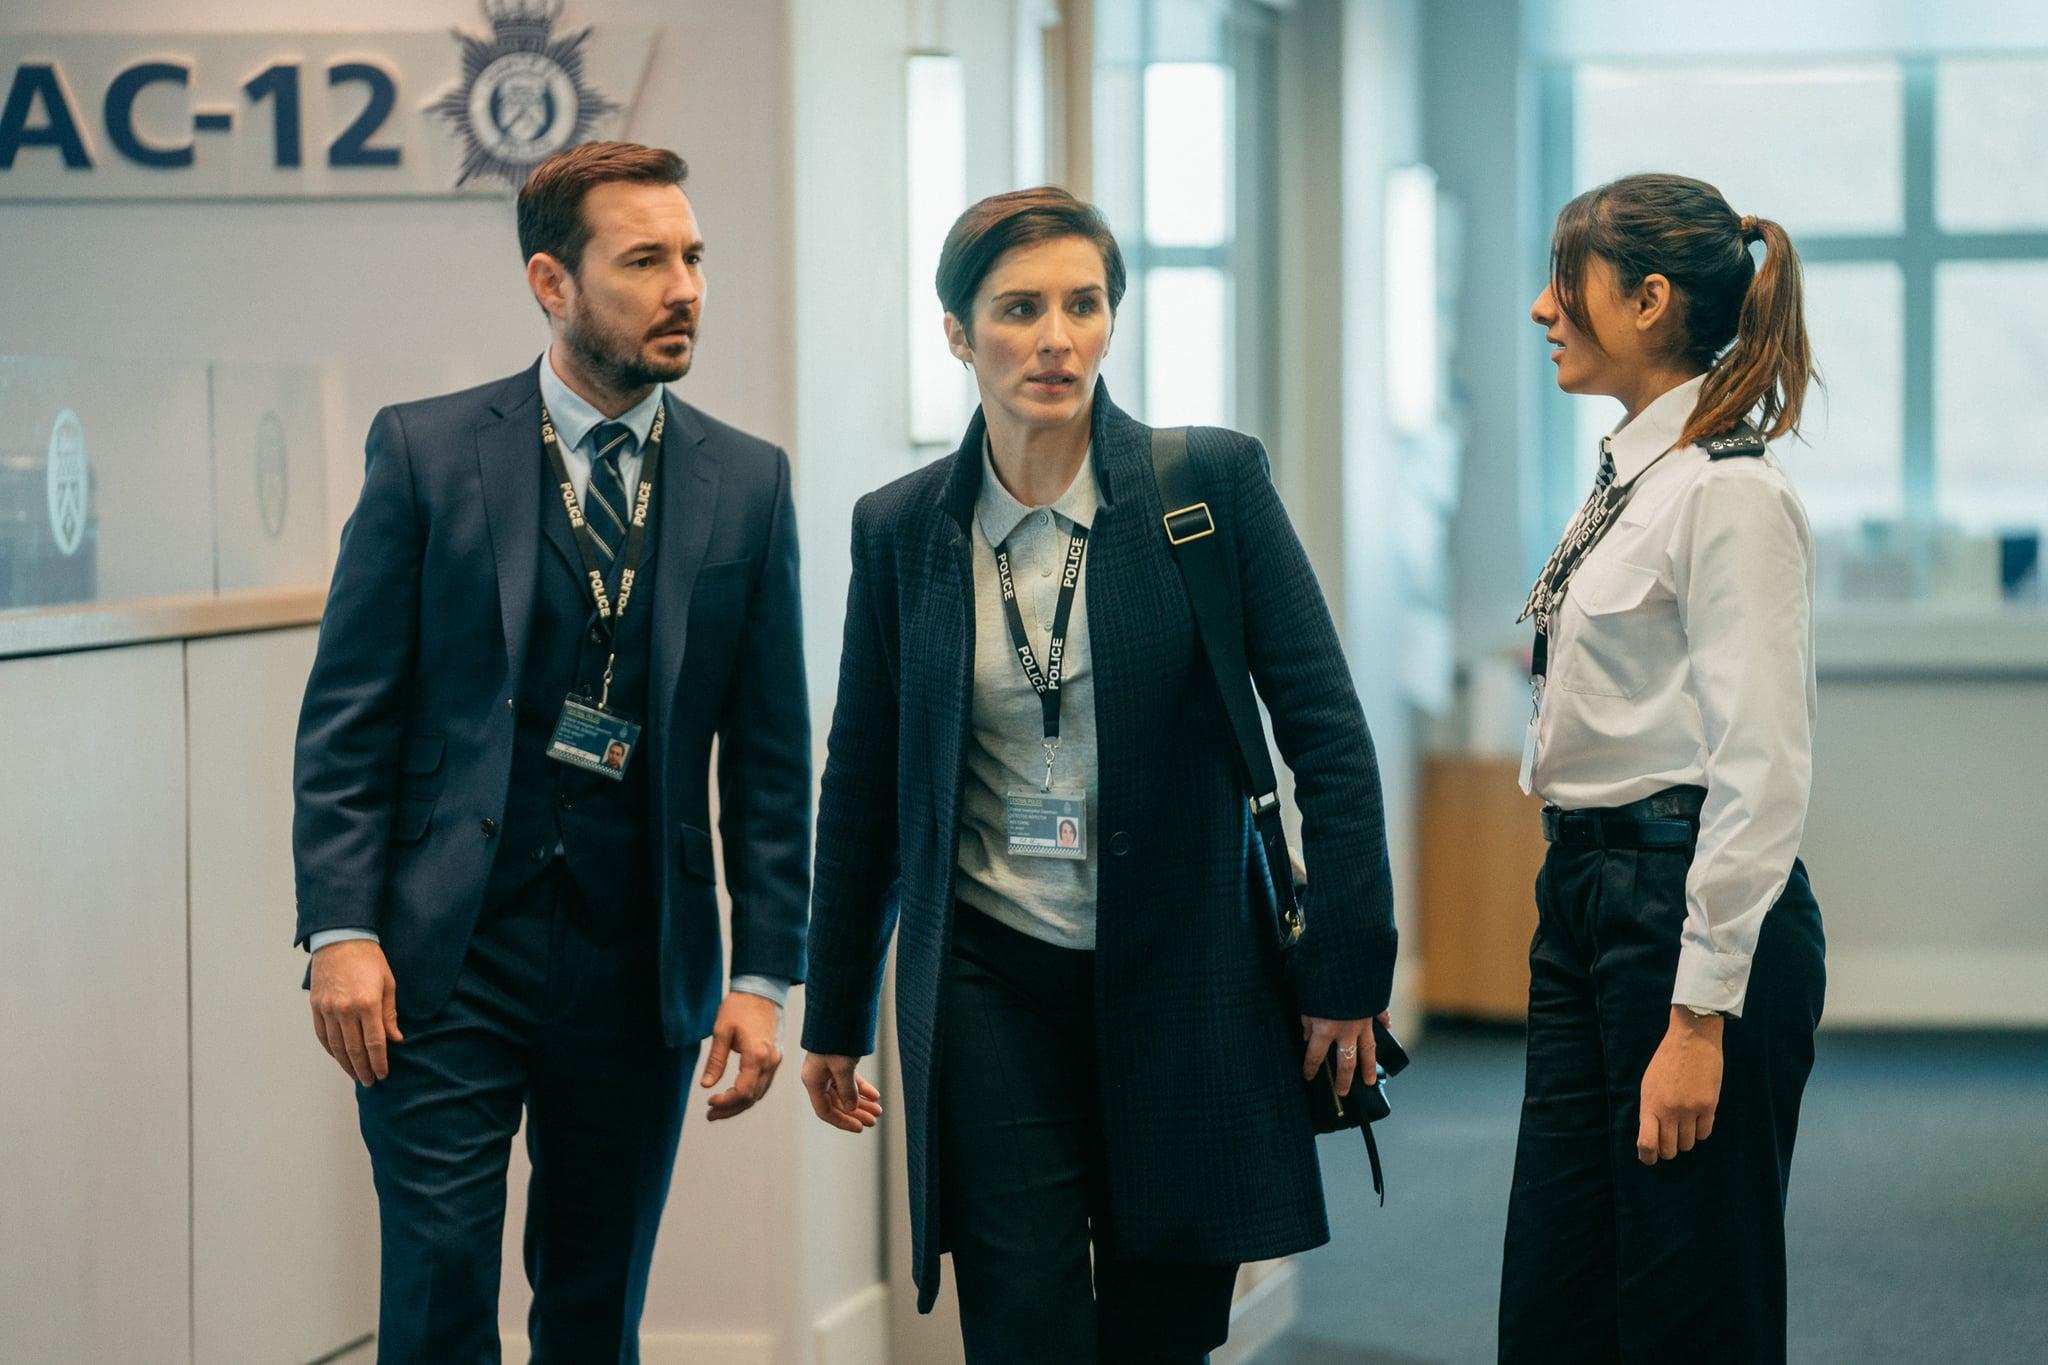 LINE OF DUTY, Martin Compston, Vicky McClure, (Season 5, 2019). BBC/Acorn Tv / courtesy Everett Collection